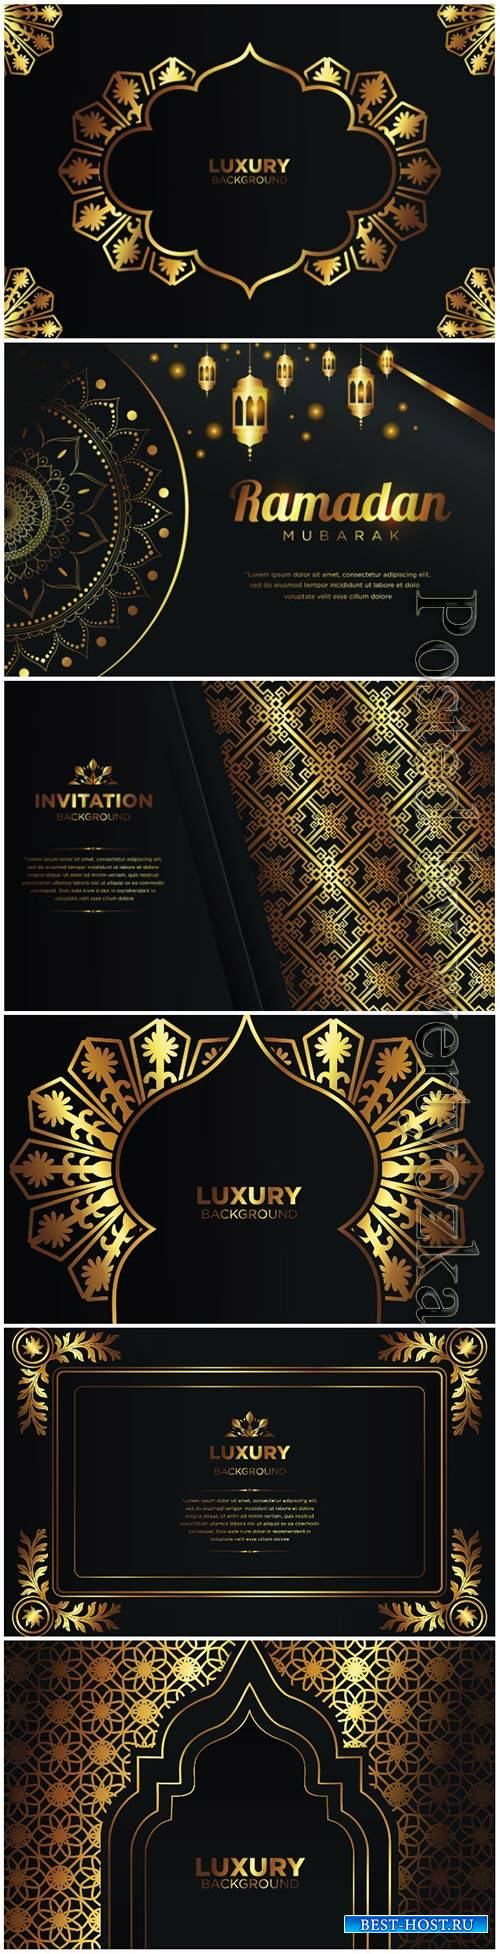 Luxury background ramadan islamic arabesque